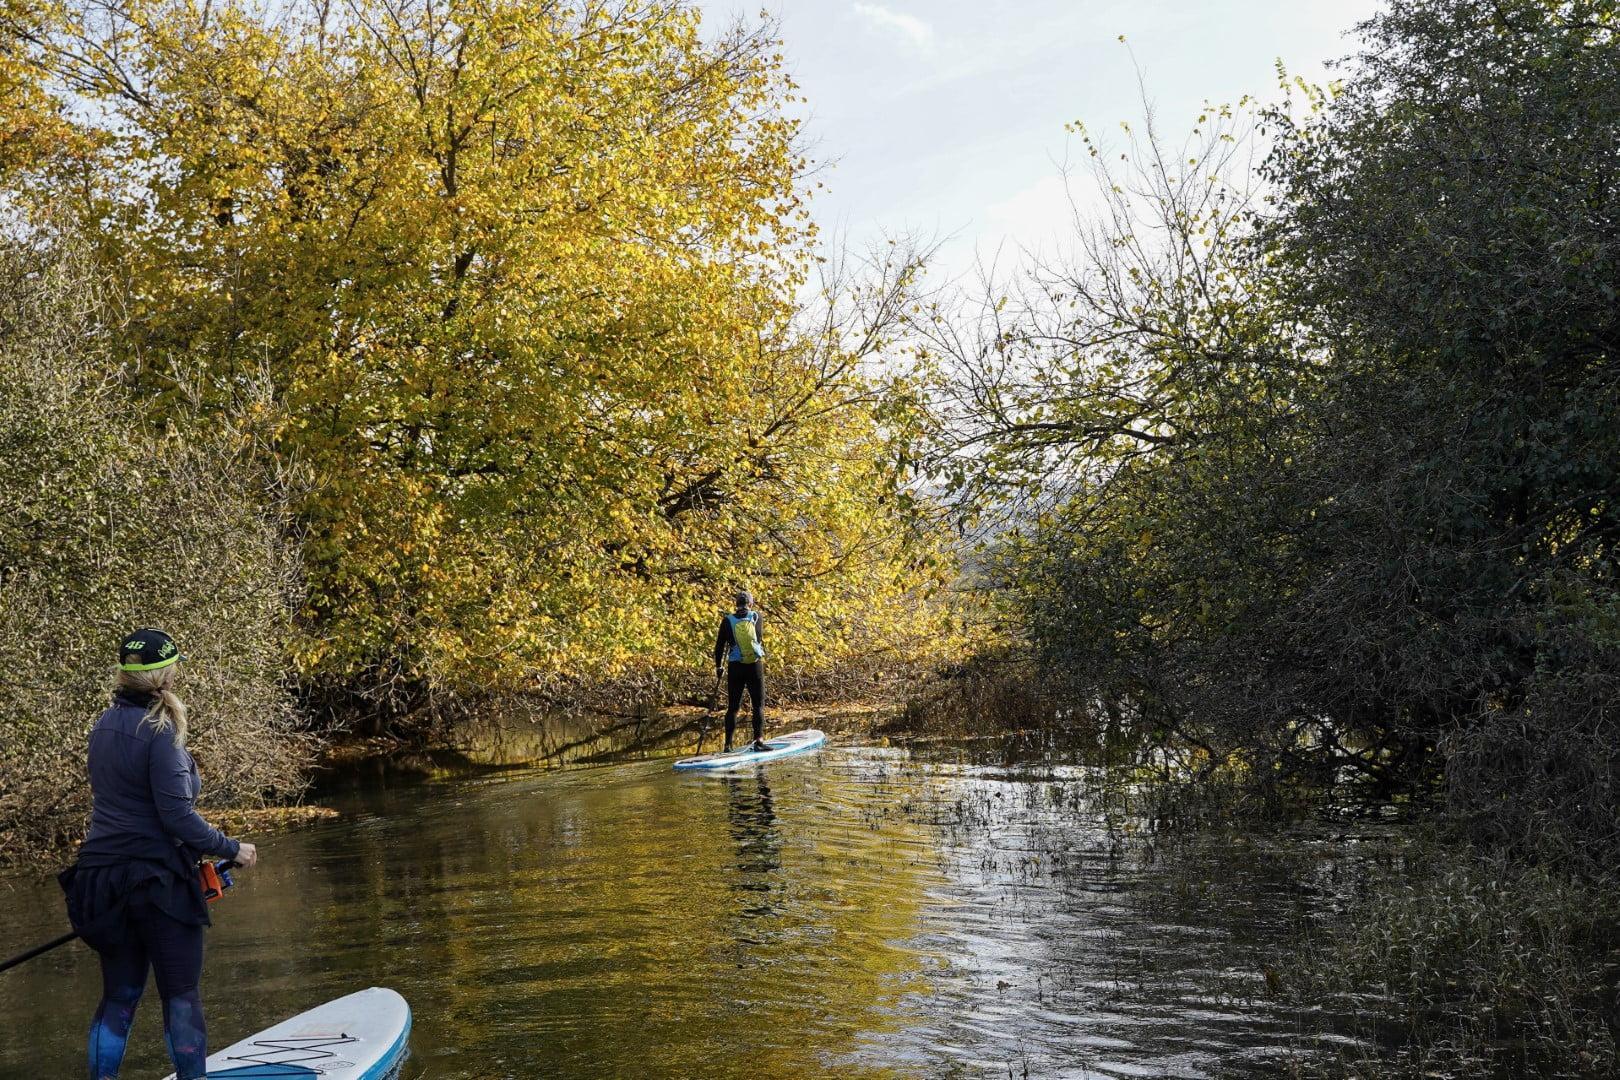 Dva suparja raziskujeta krajinski parku Radensko polje